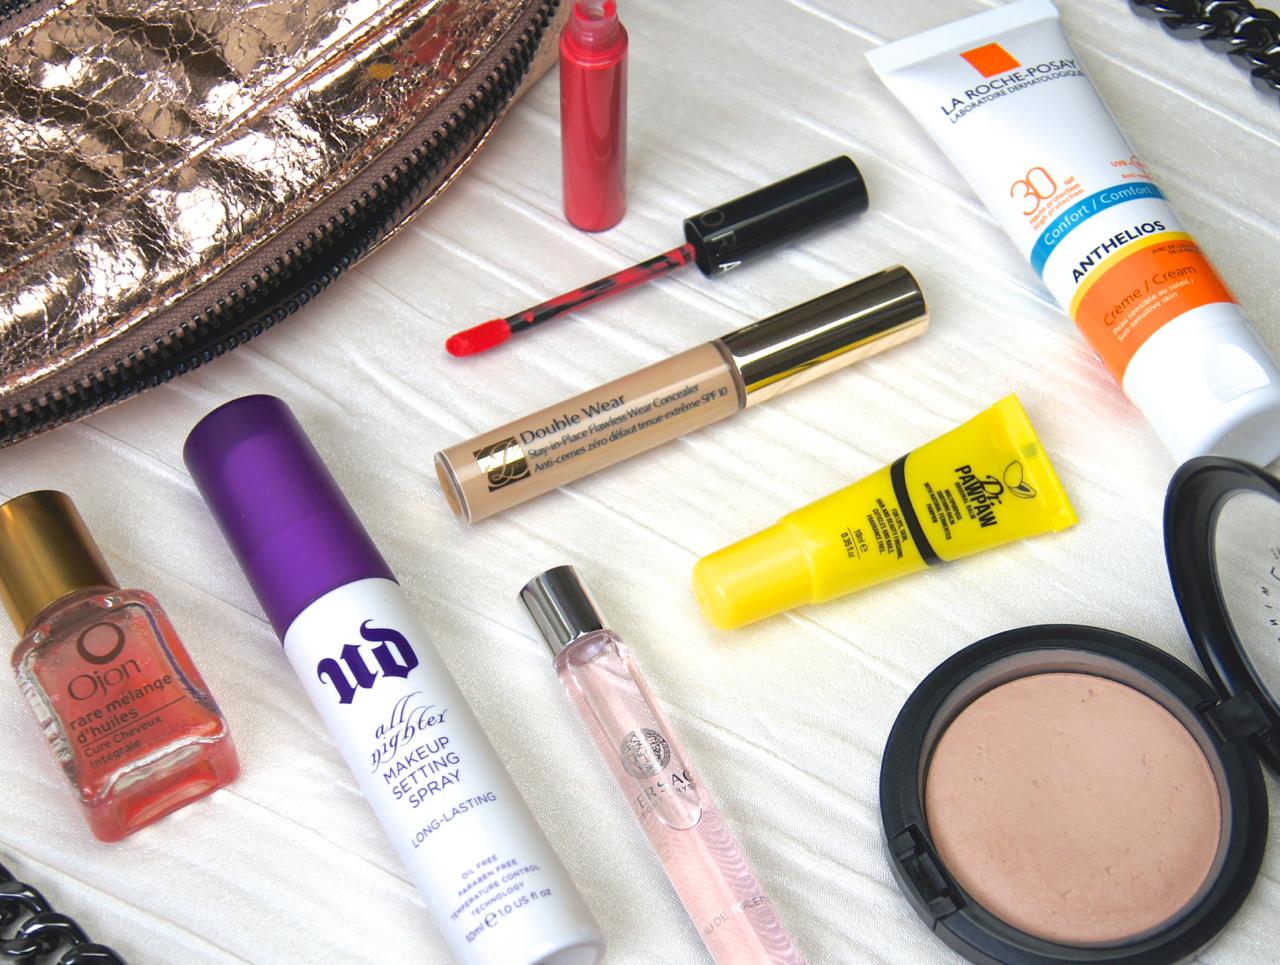 summer beauty what's in my handbag essentials spf powder concealer fragrance setting spray hair oil bright lipstick